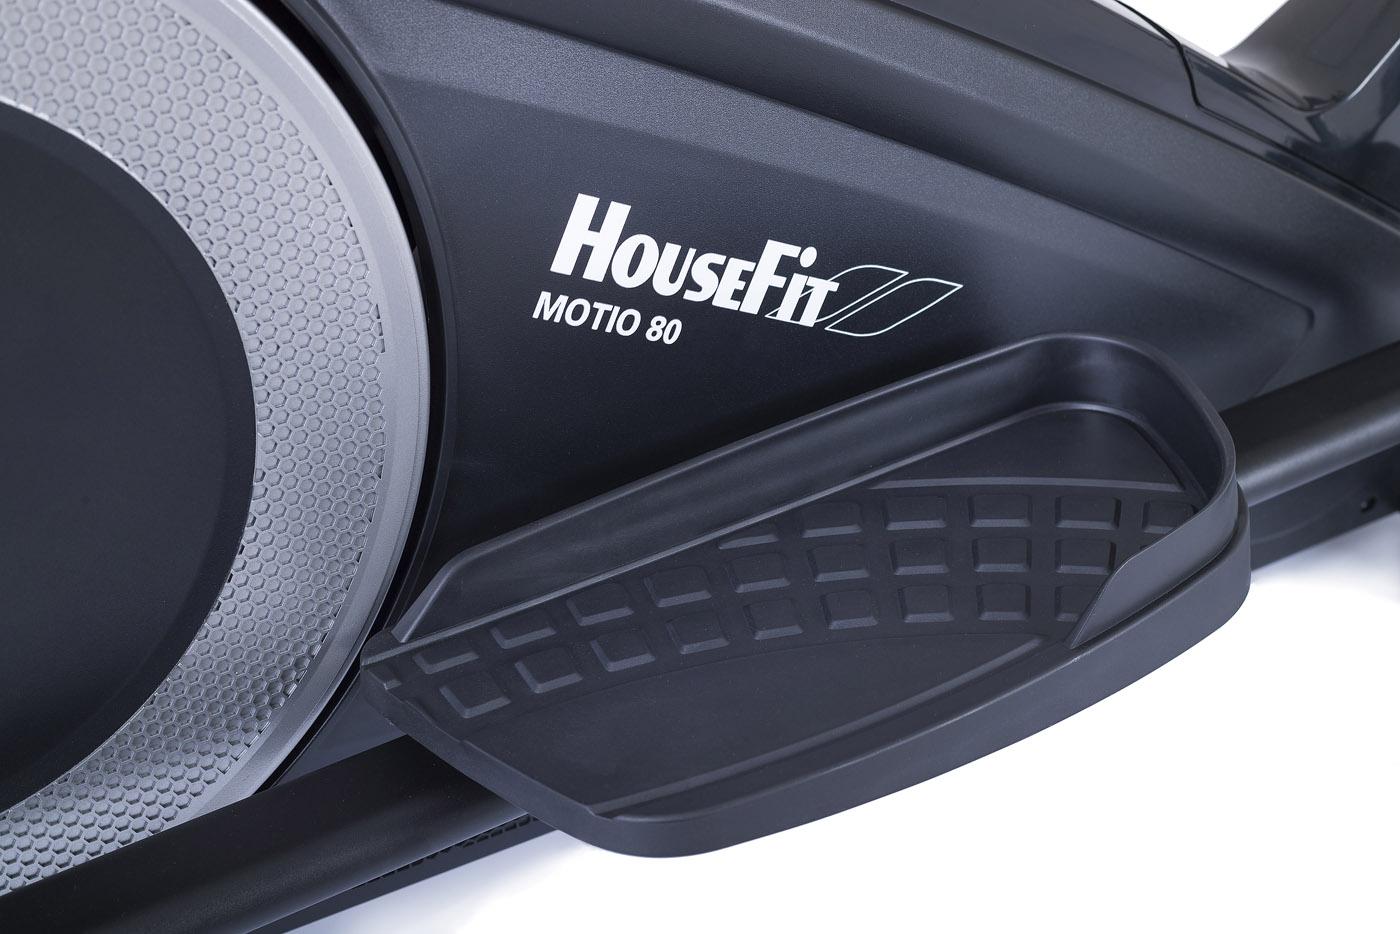 Housefit Motio 80_nášlap